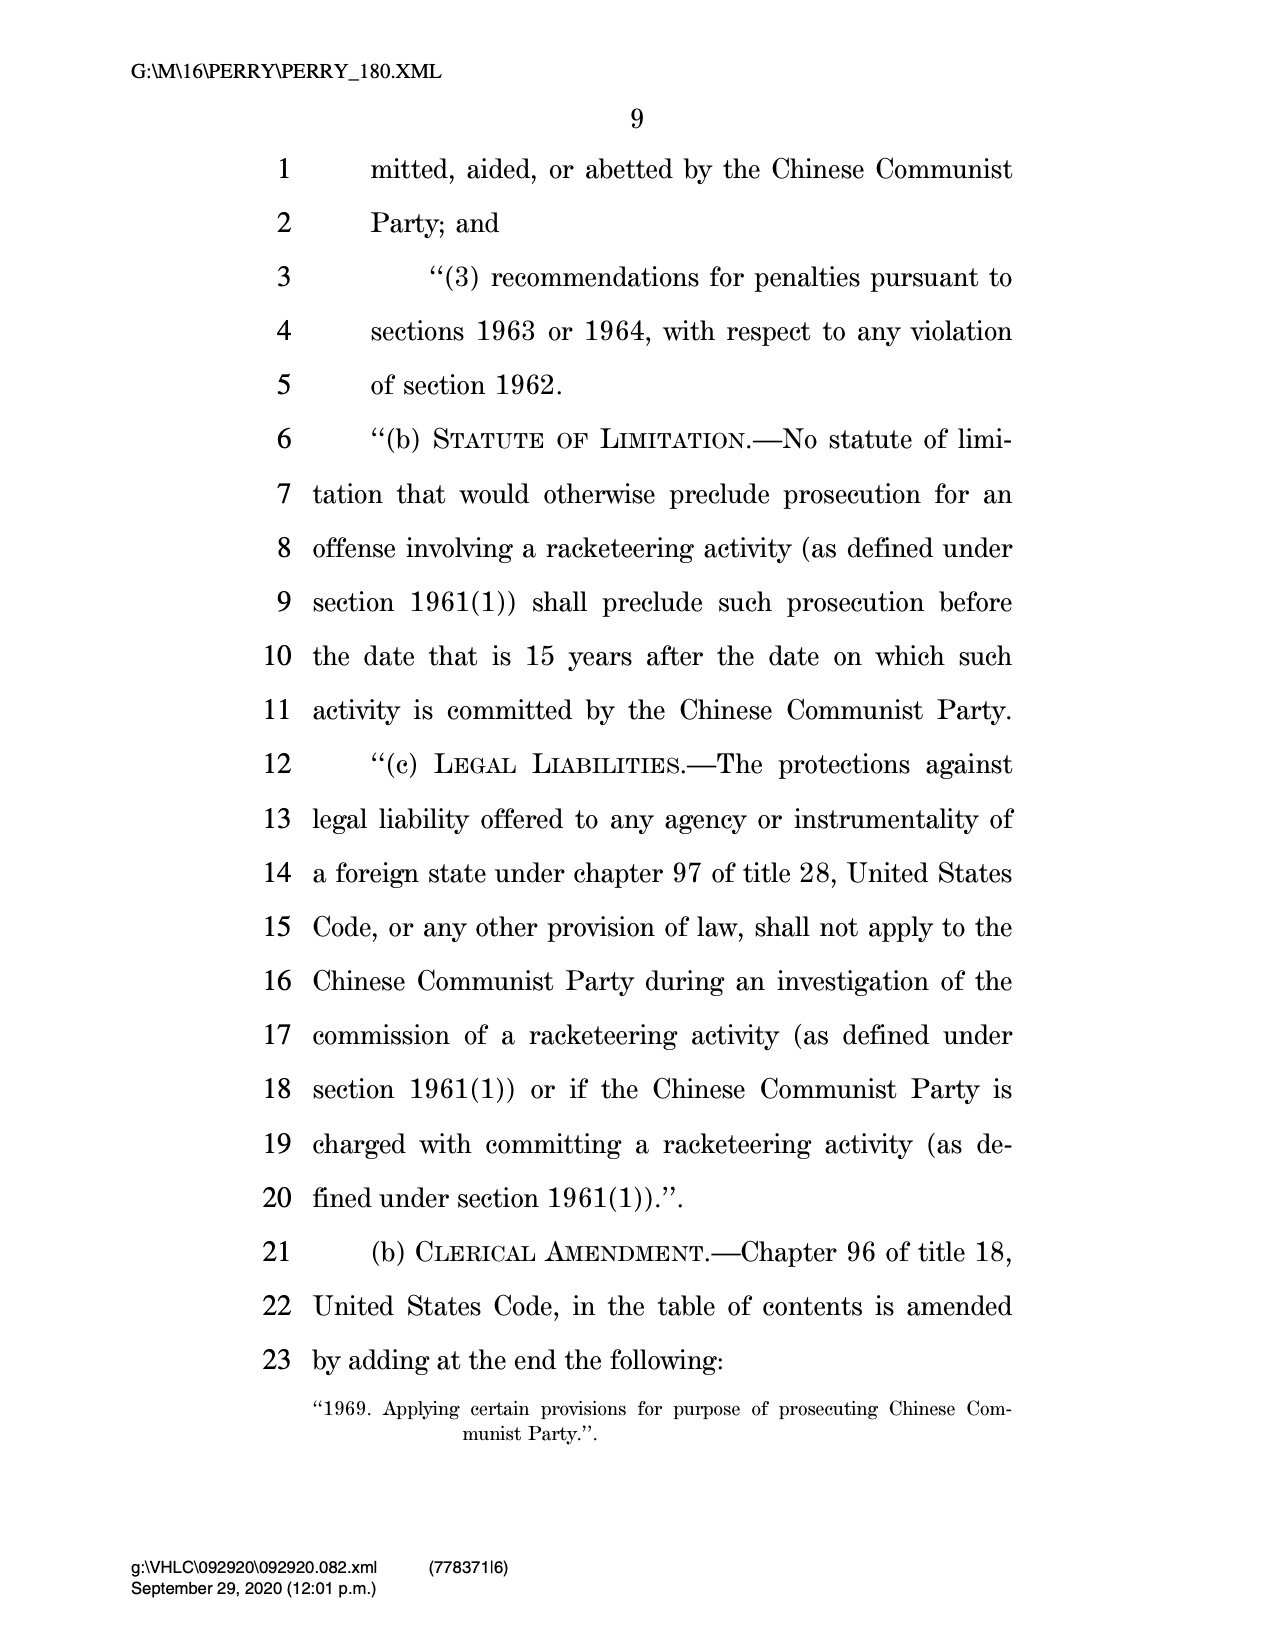 CCP as a TOC Bill - Final Edition9.jpg